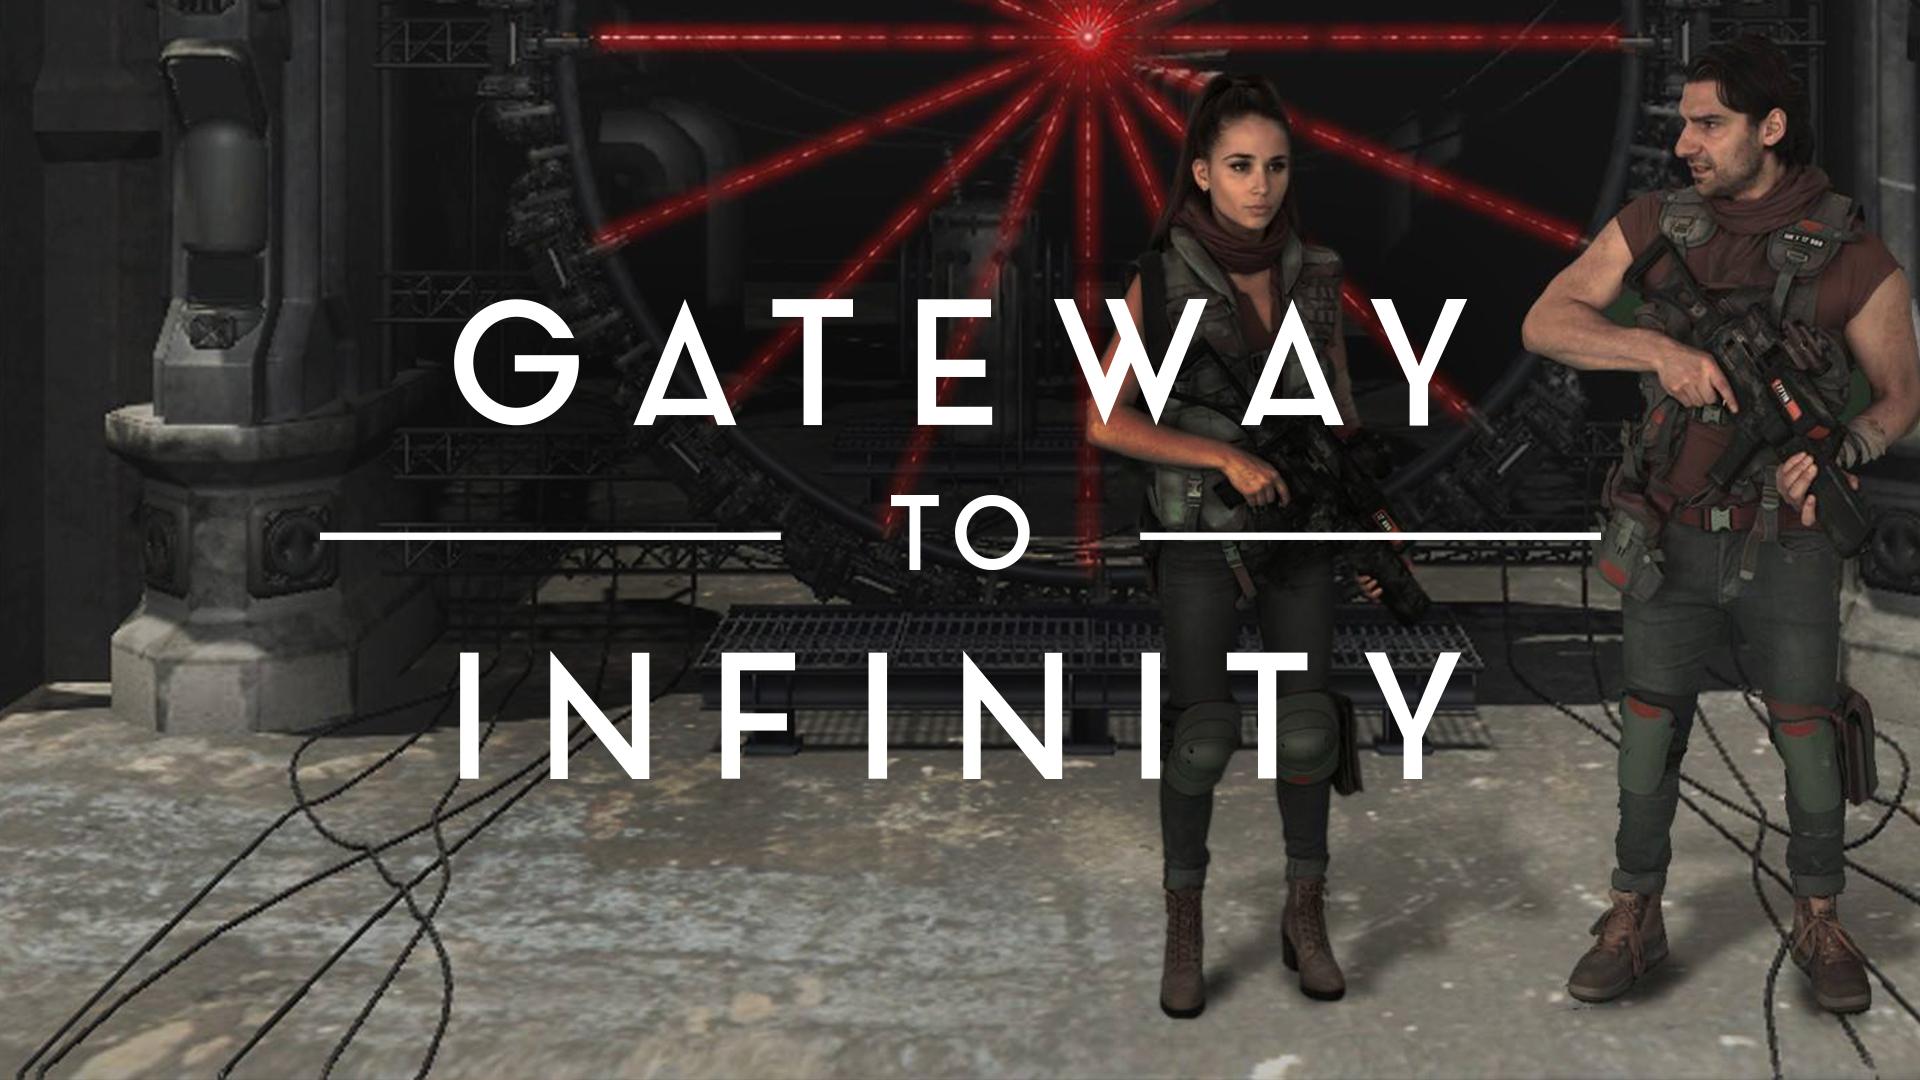 GatewayToInfinity_thumbnail.jpg